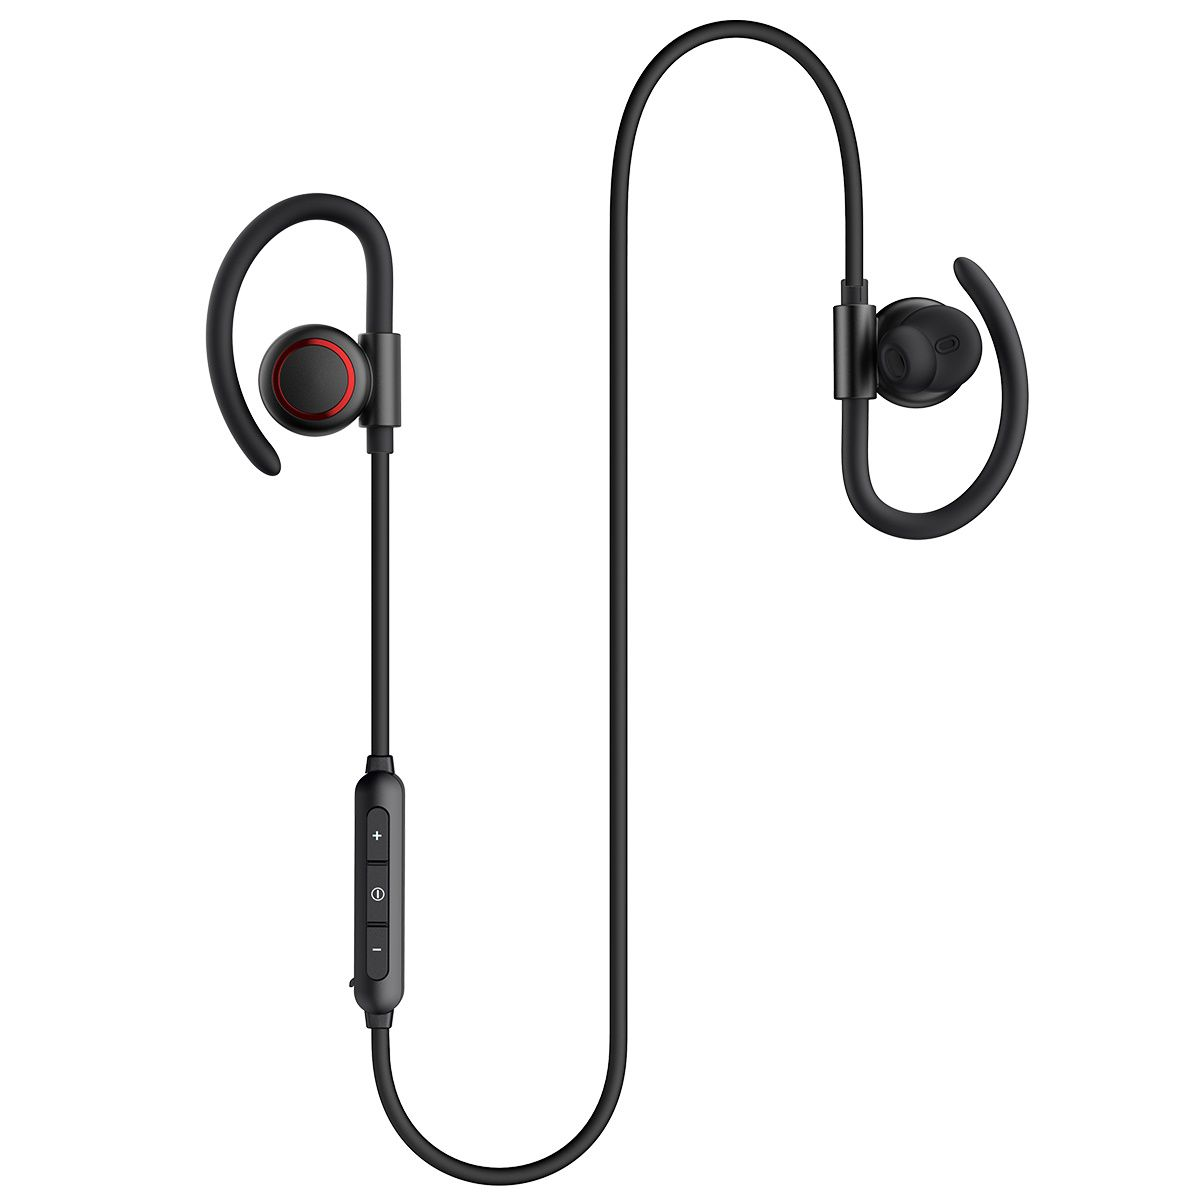 Fone de Ouvido Bluetooth Baseus Encok Gout Sports S17